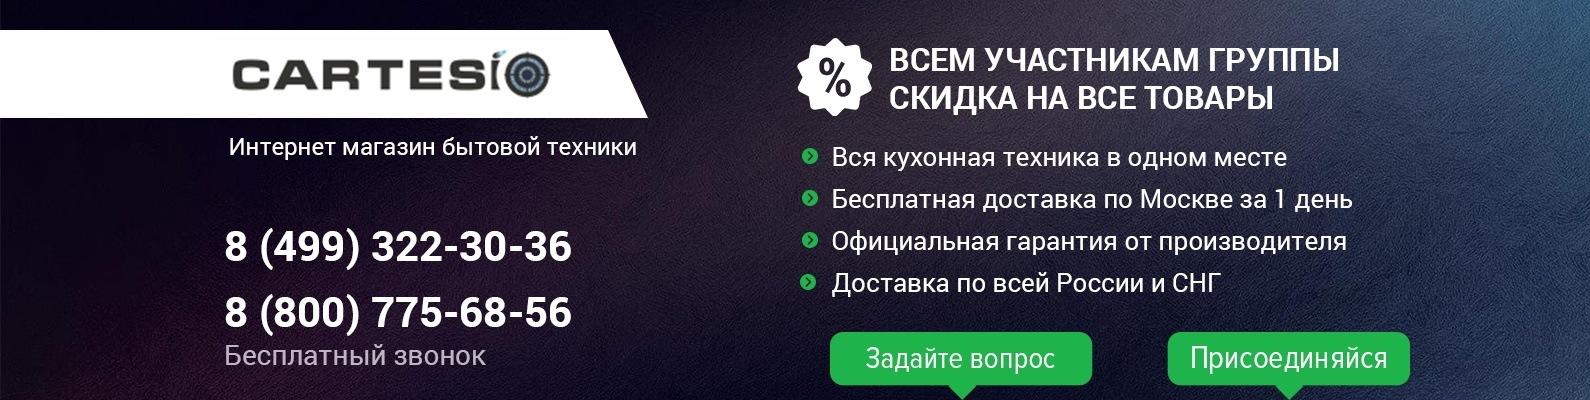 Cartesio Интернет-магазин кухонной техники   ВКонтакте 658d188f440